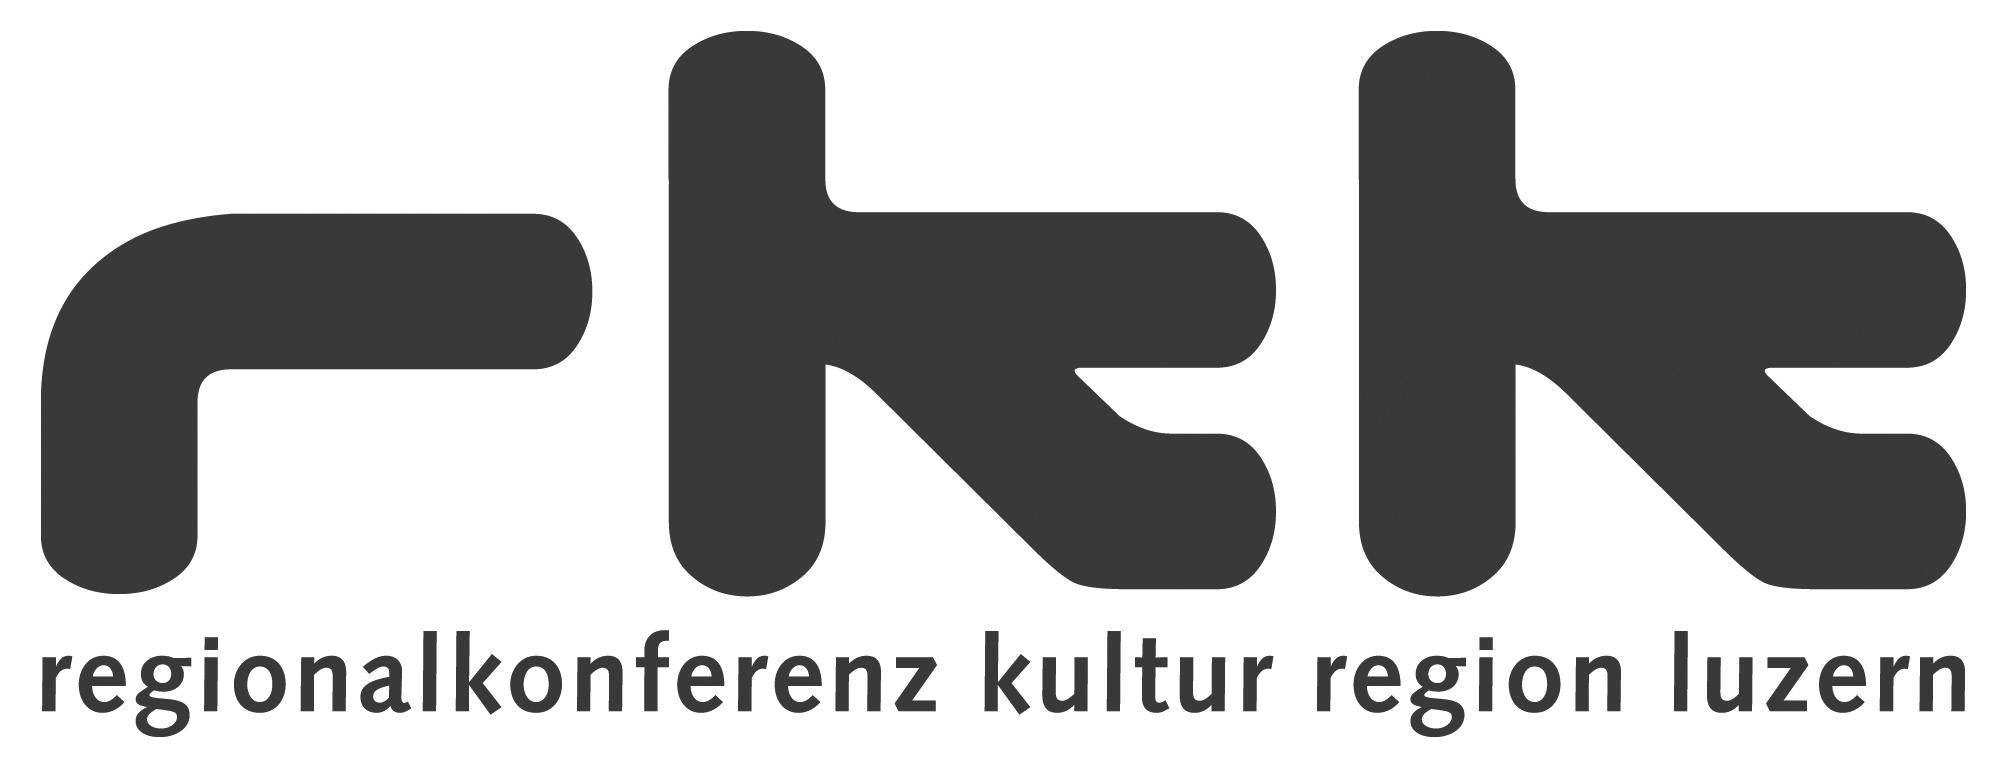 RKK - Regionalkonferenz Kultur Region Luzern